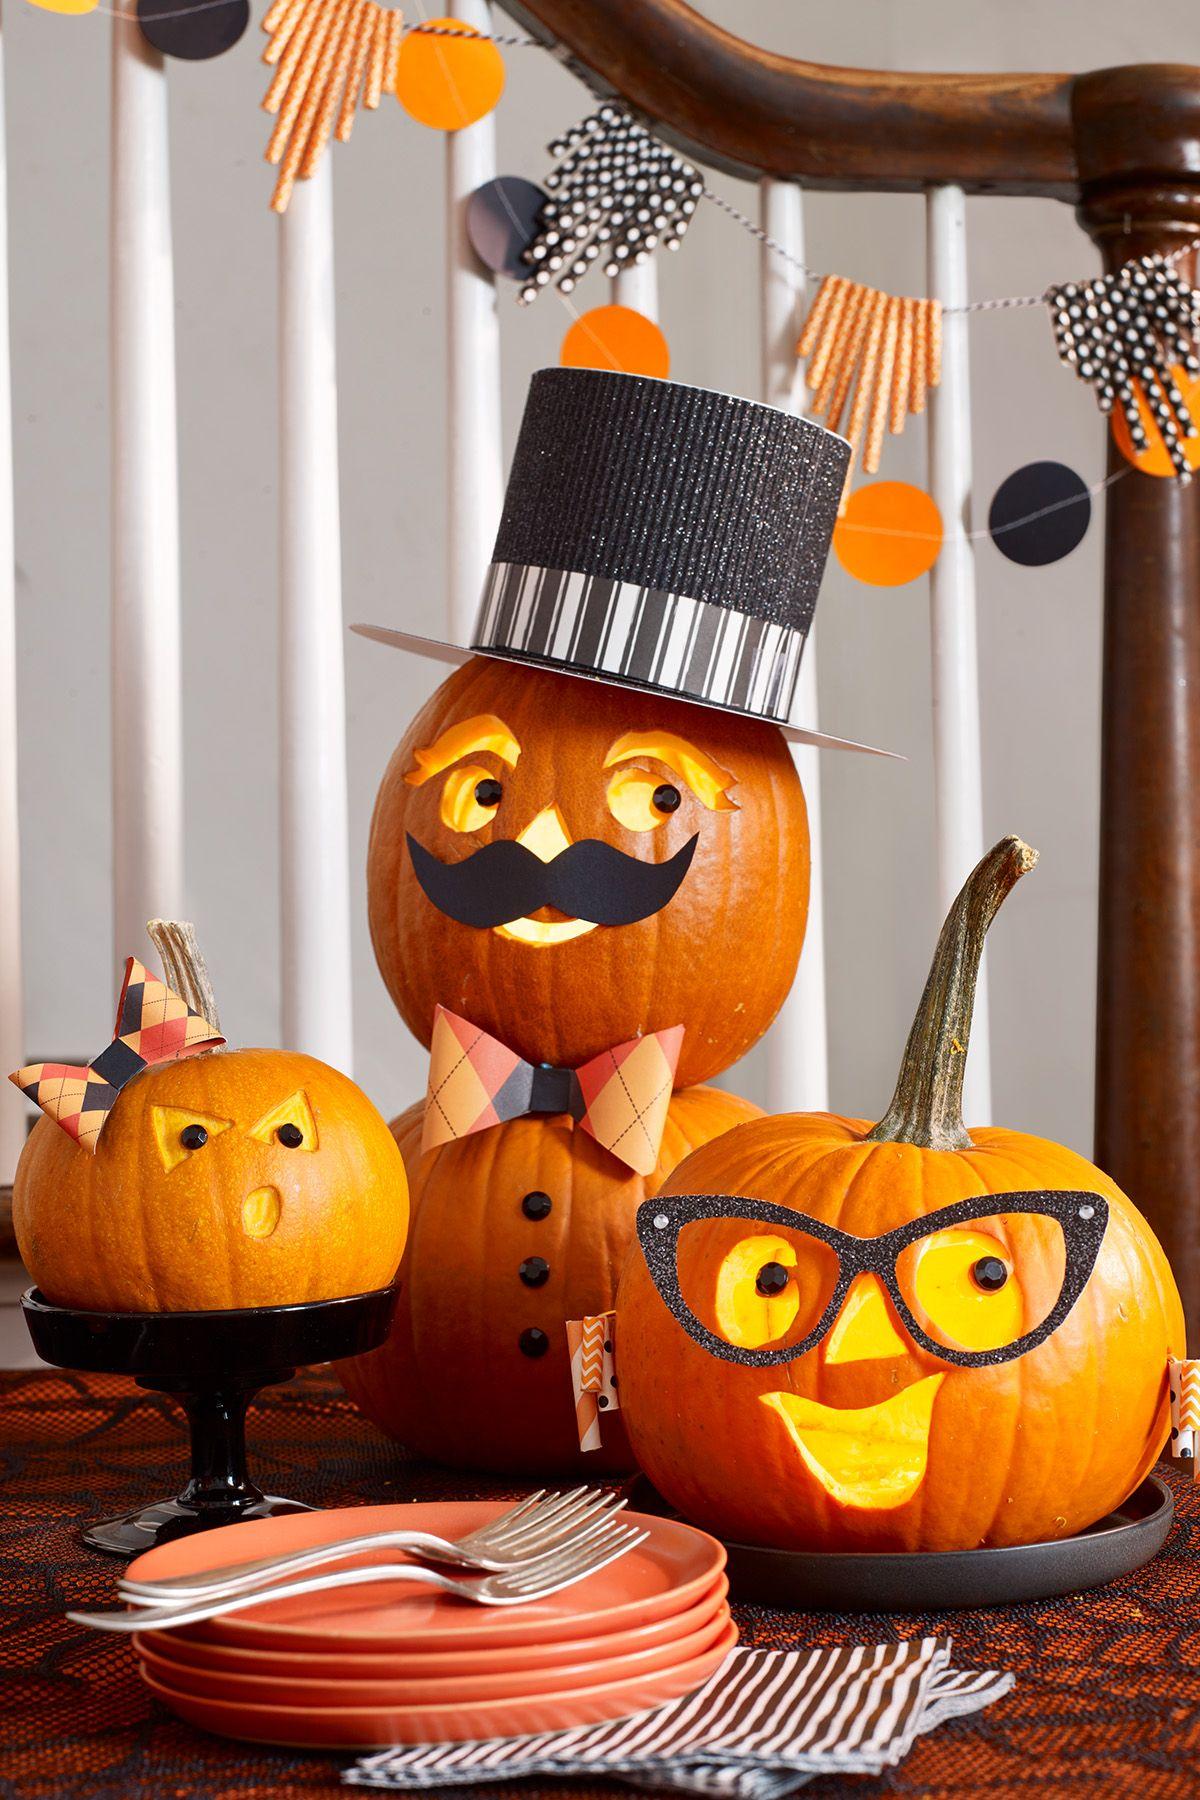 RAE: Adult pumpkin carving ideas